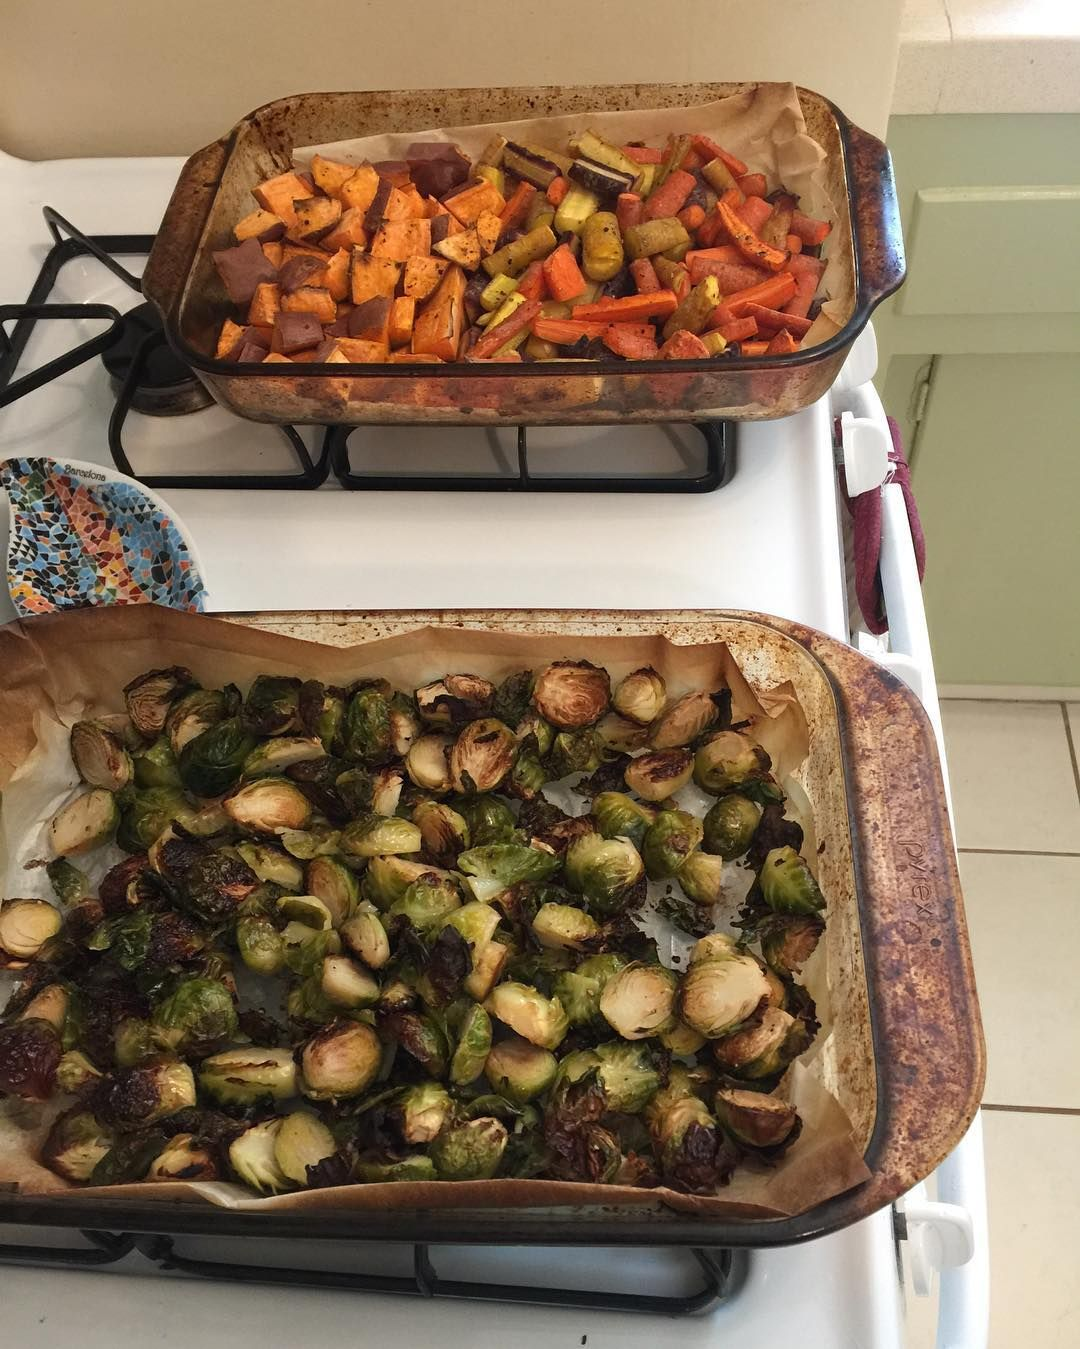 #VEGGIES!!! #BrusselSprouts #heirloom #carrots #sweetpotatoes - roasted in #olive oil salt pepper - 425 degrees - 40 minutes.